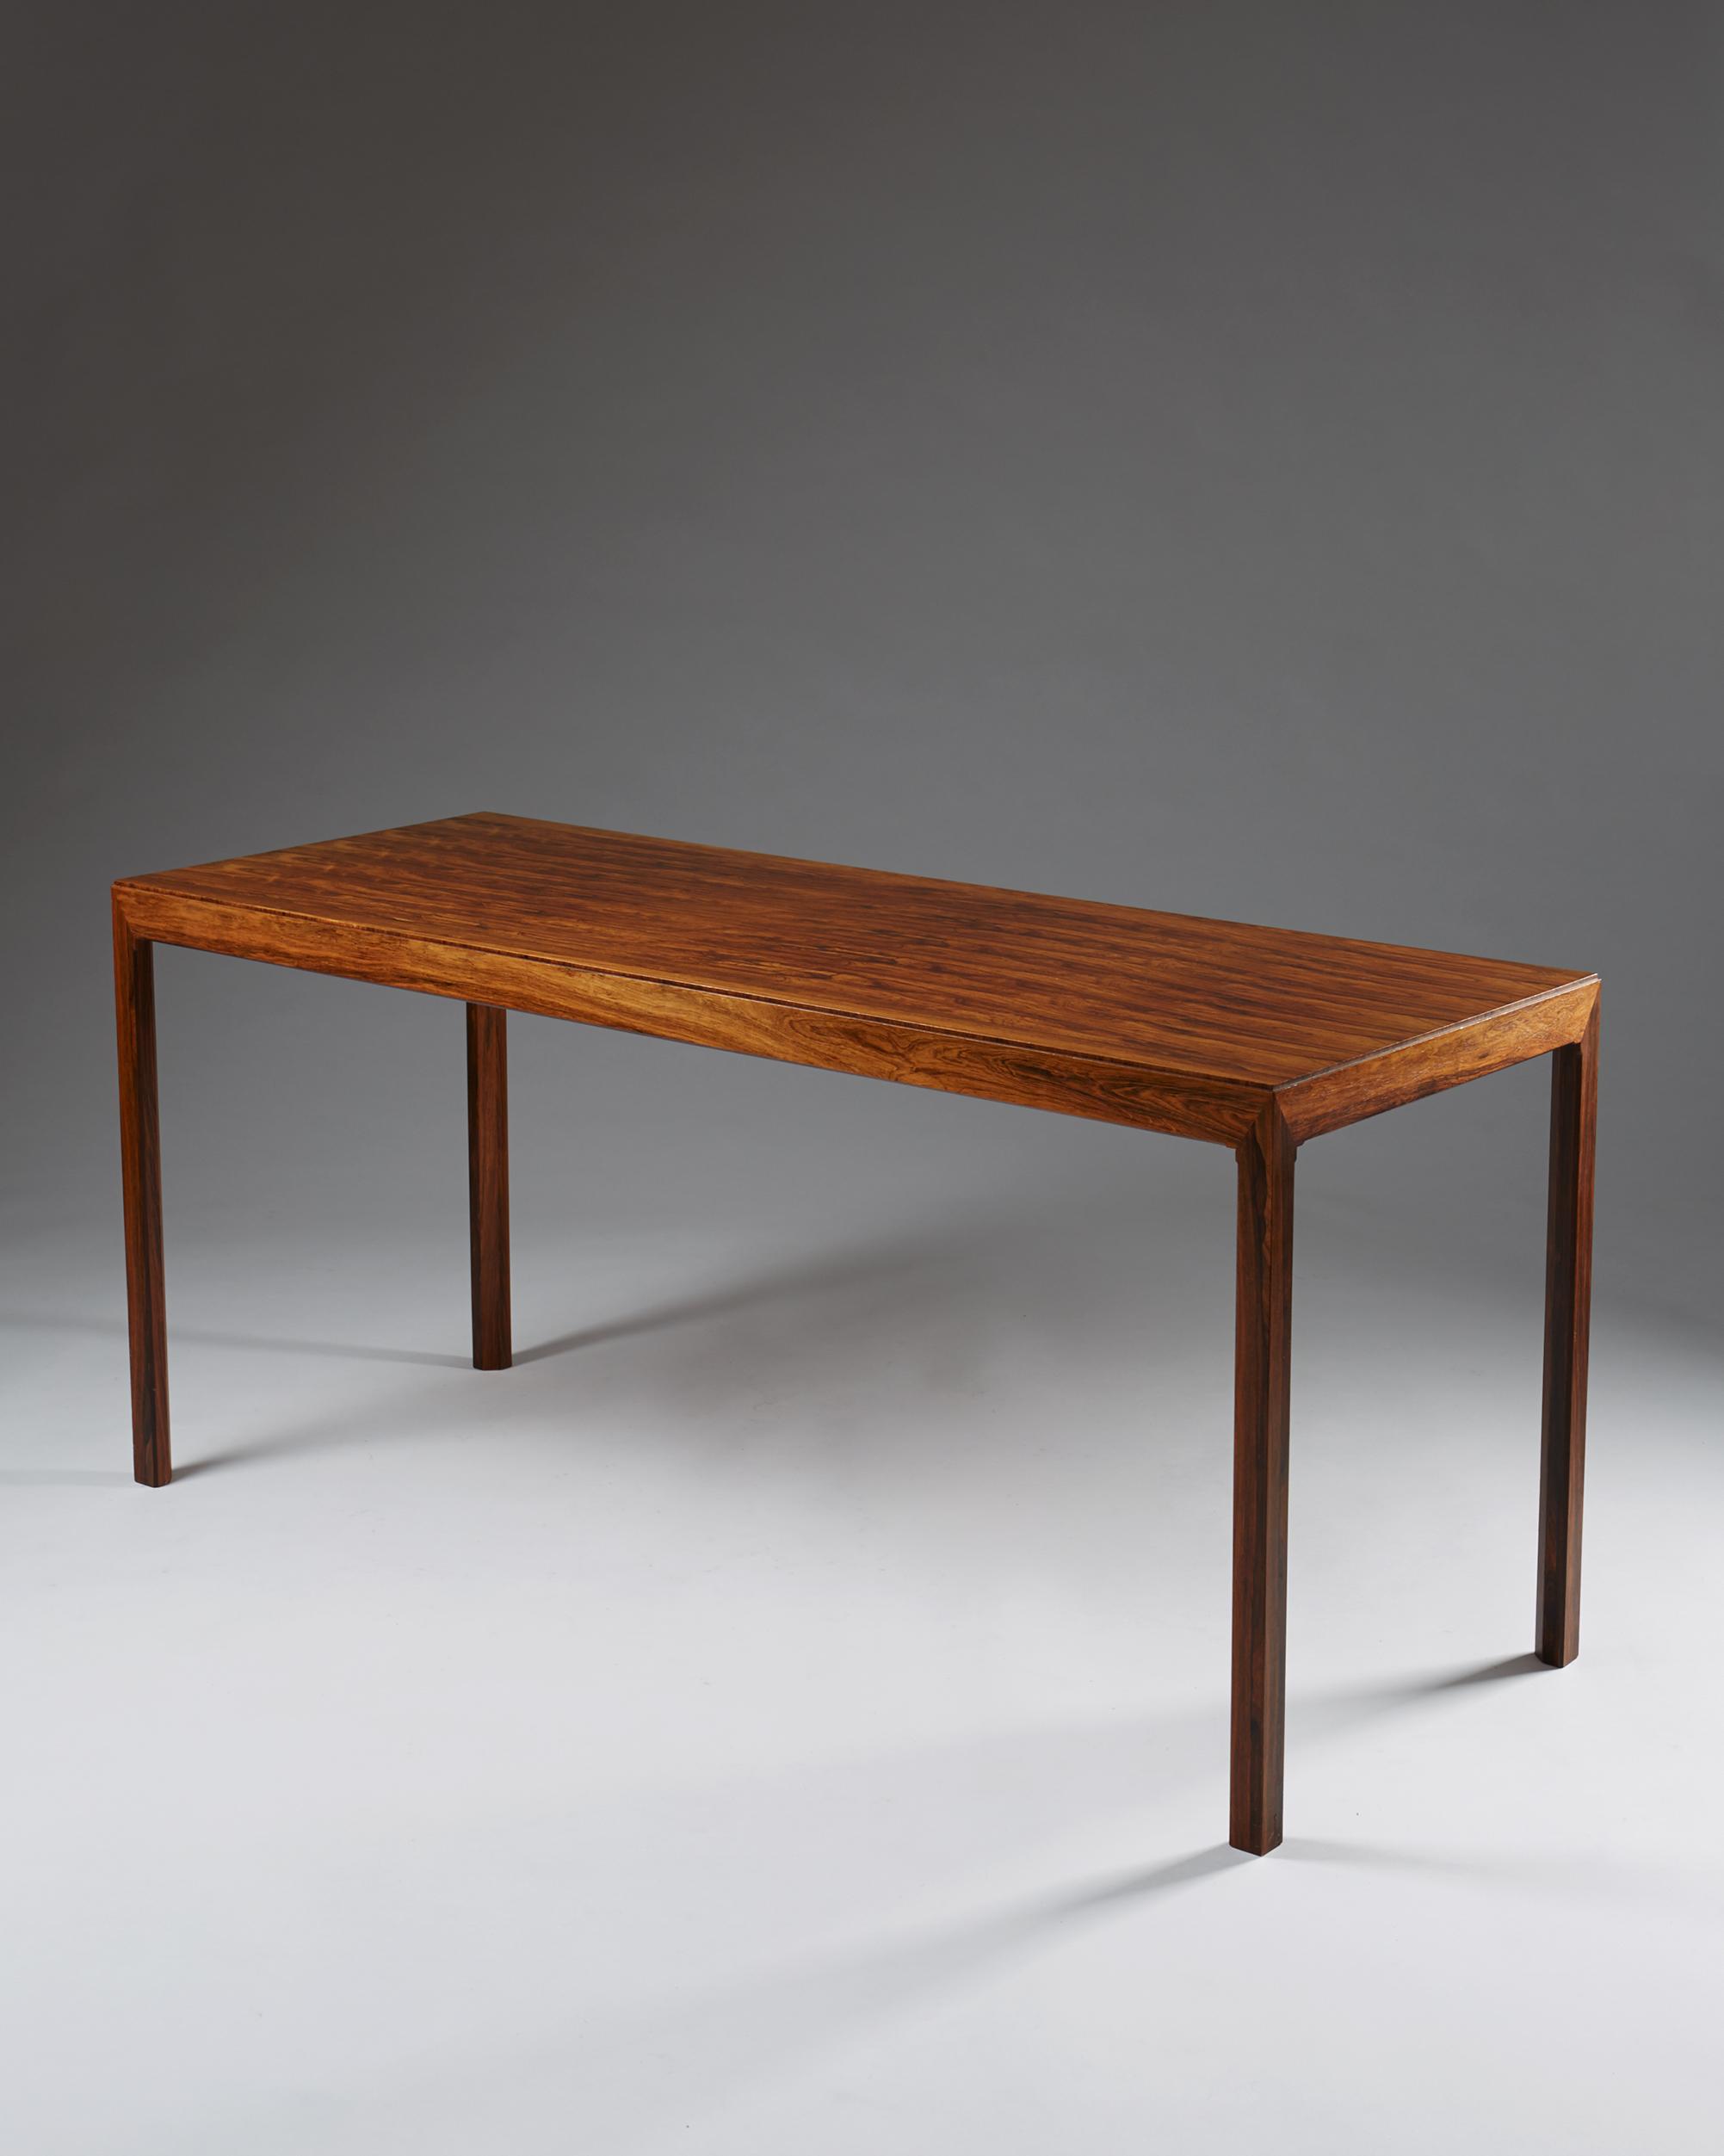 Erik Chambert  Library table/desk Sweden, 1959 Rosewood. 73 x 159 x 61 cm